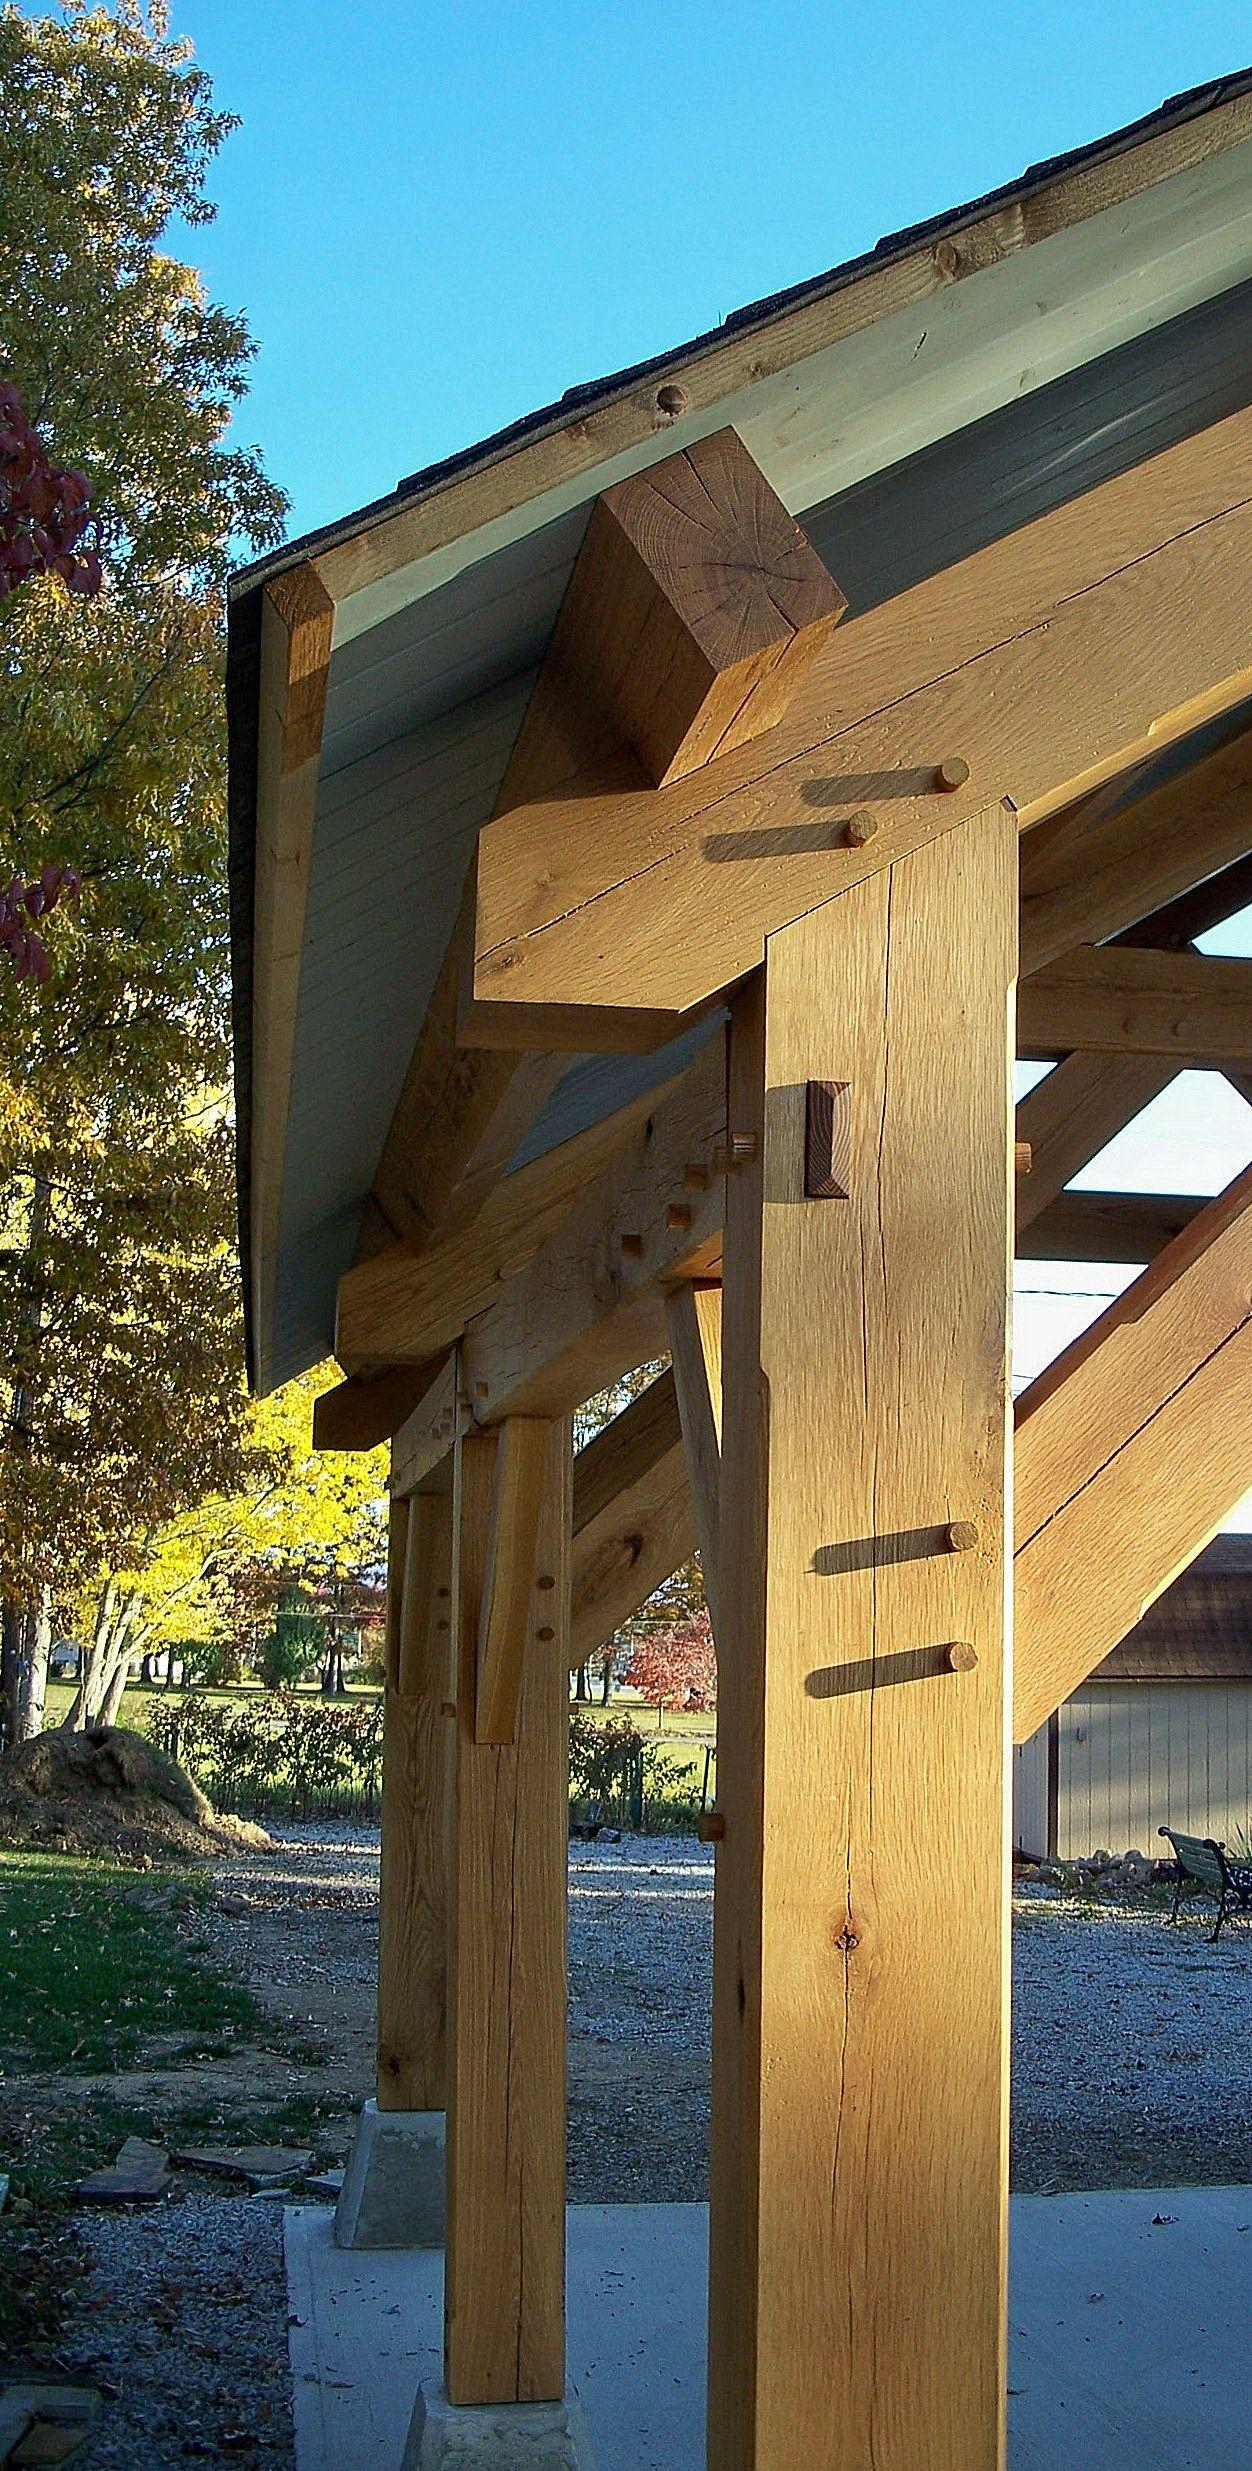 Construcci n carpinter a madera casa techo estructura - Construccion casas de madera ...